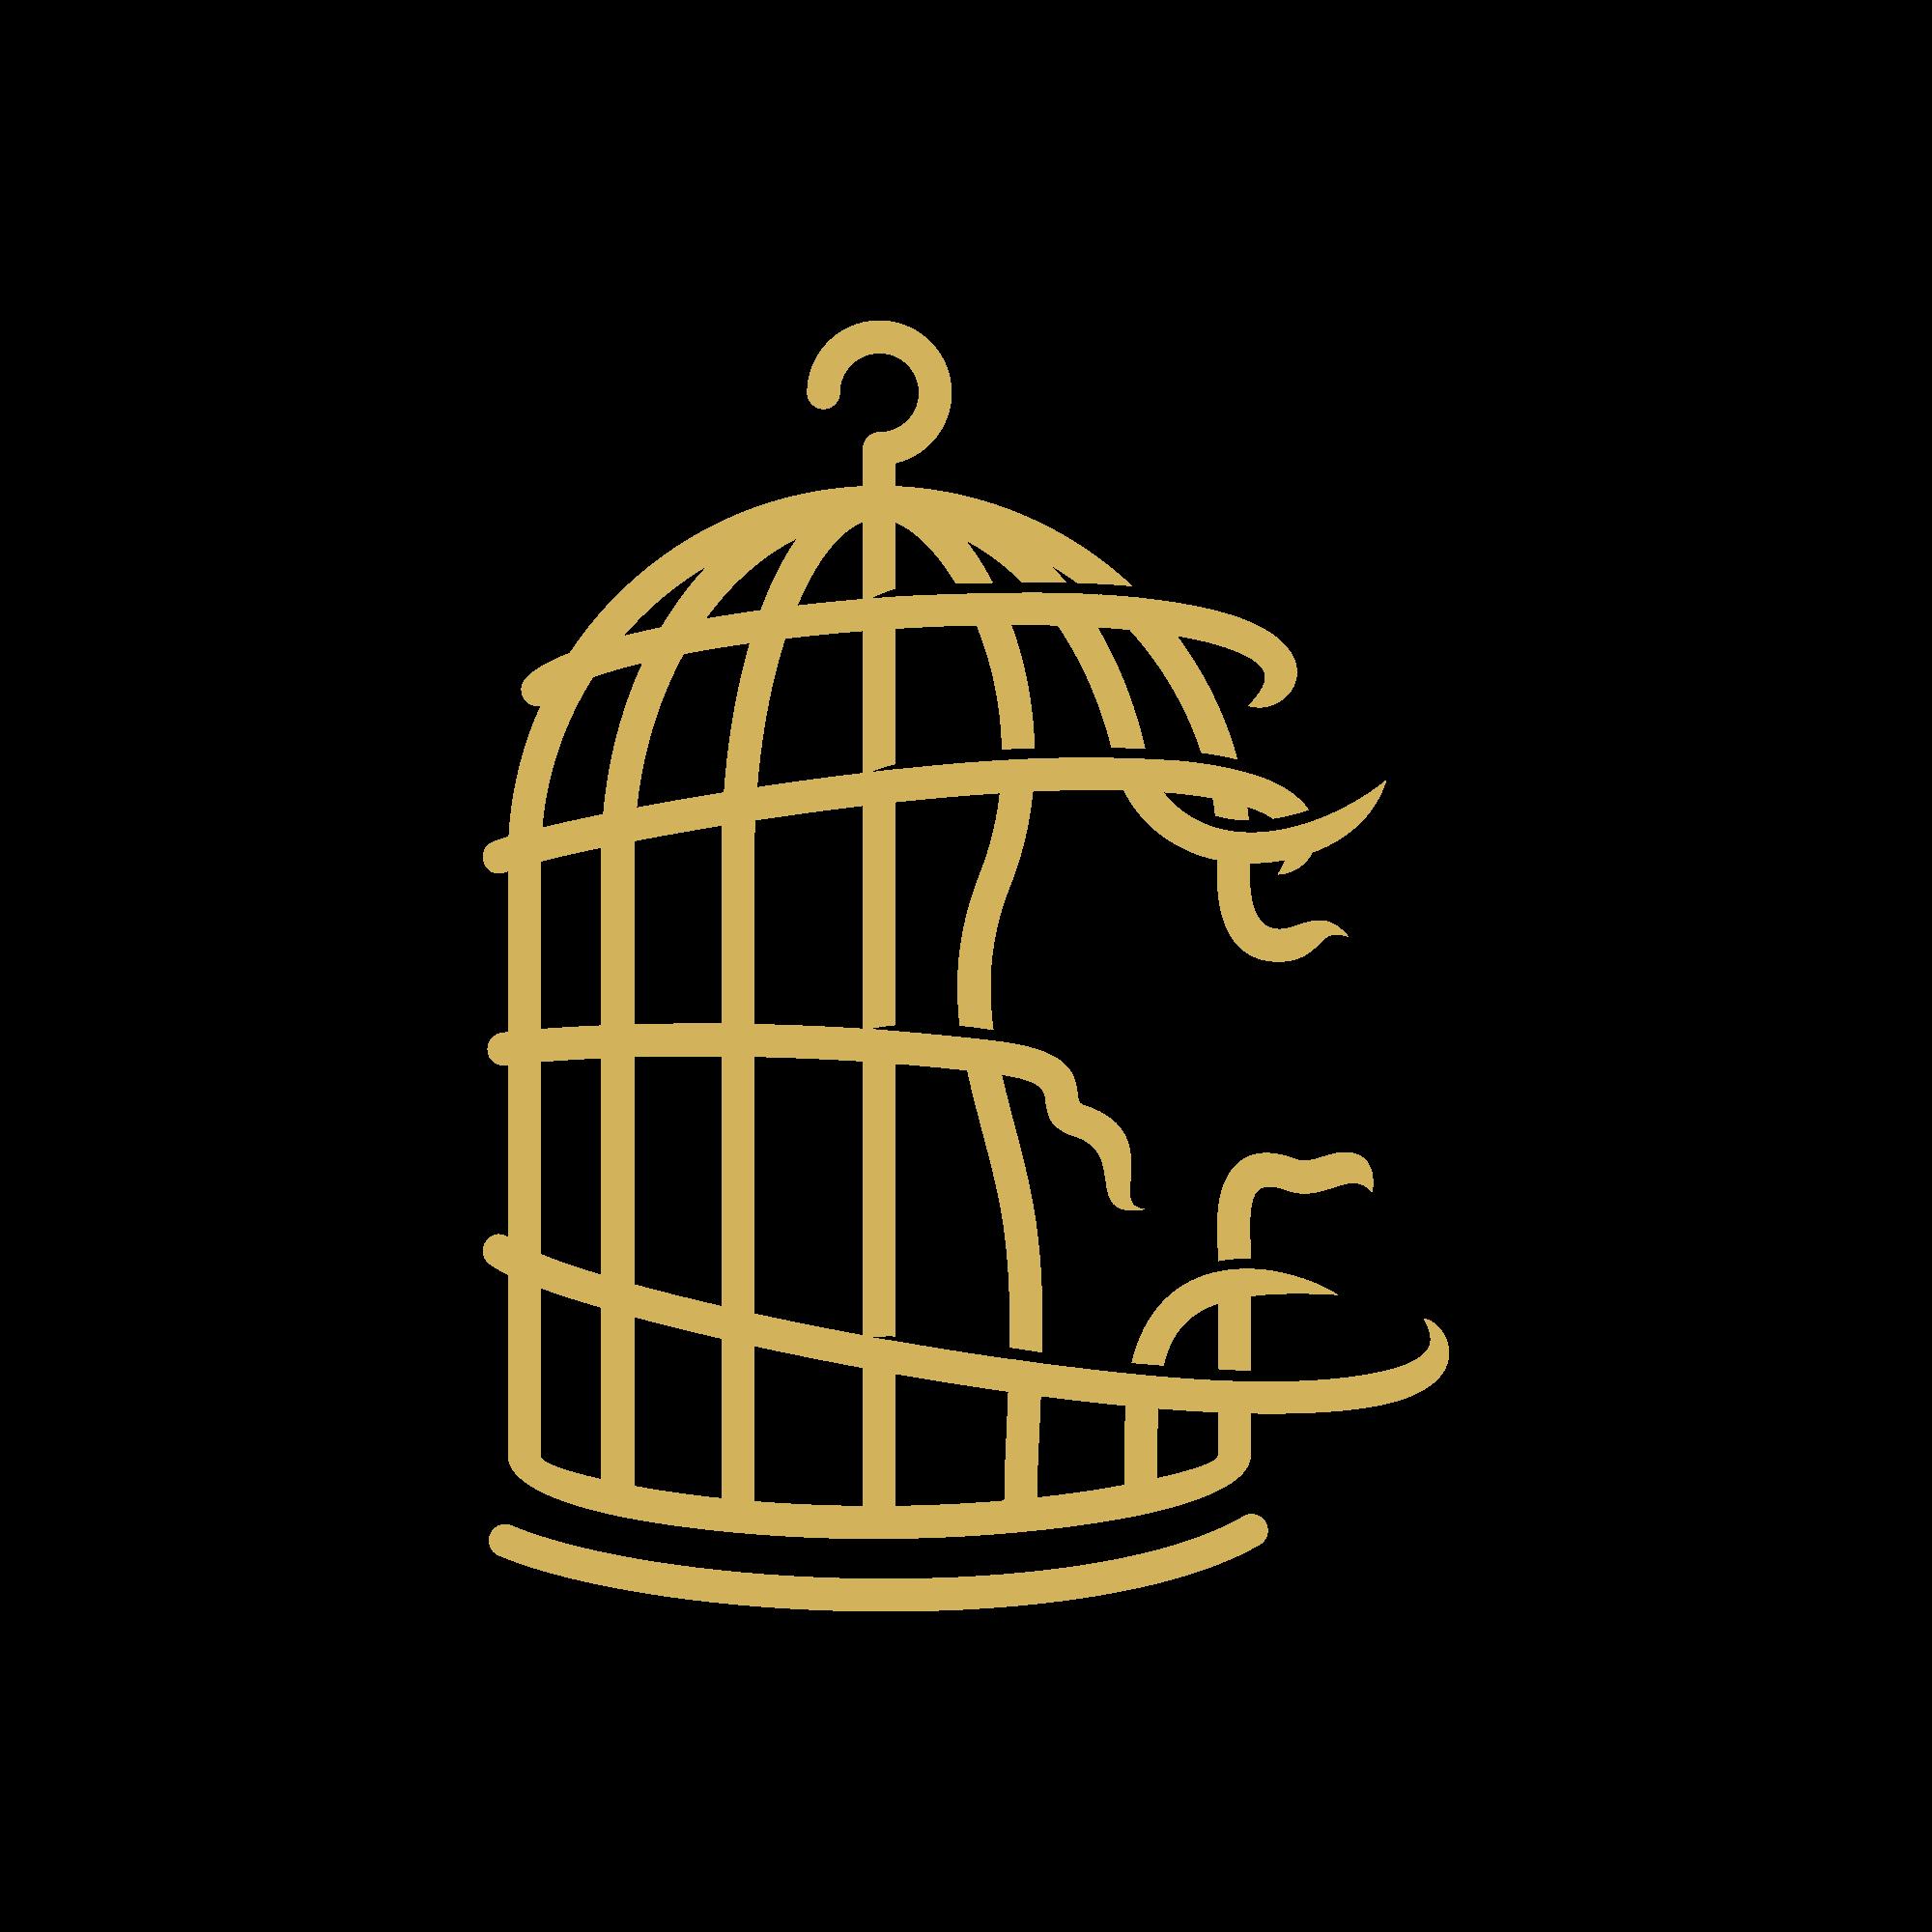 Els Van Laecke - only icon (PNG)